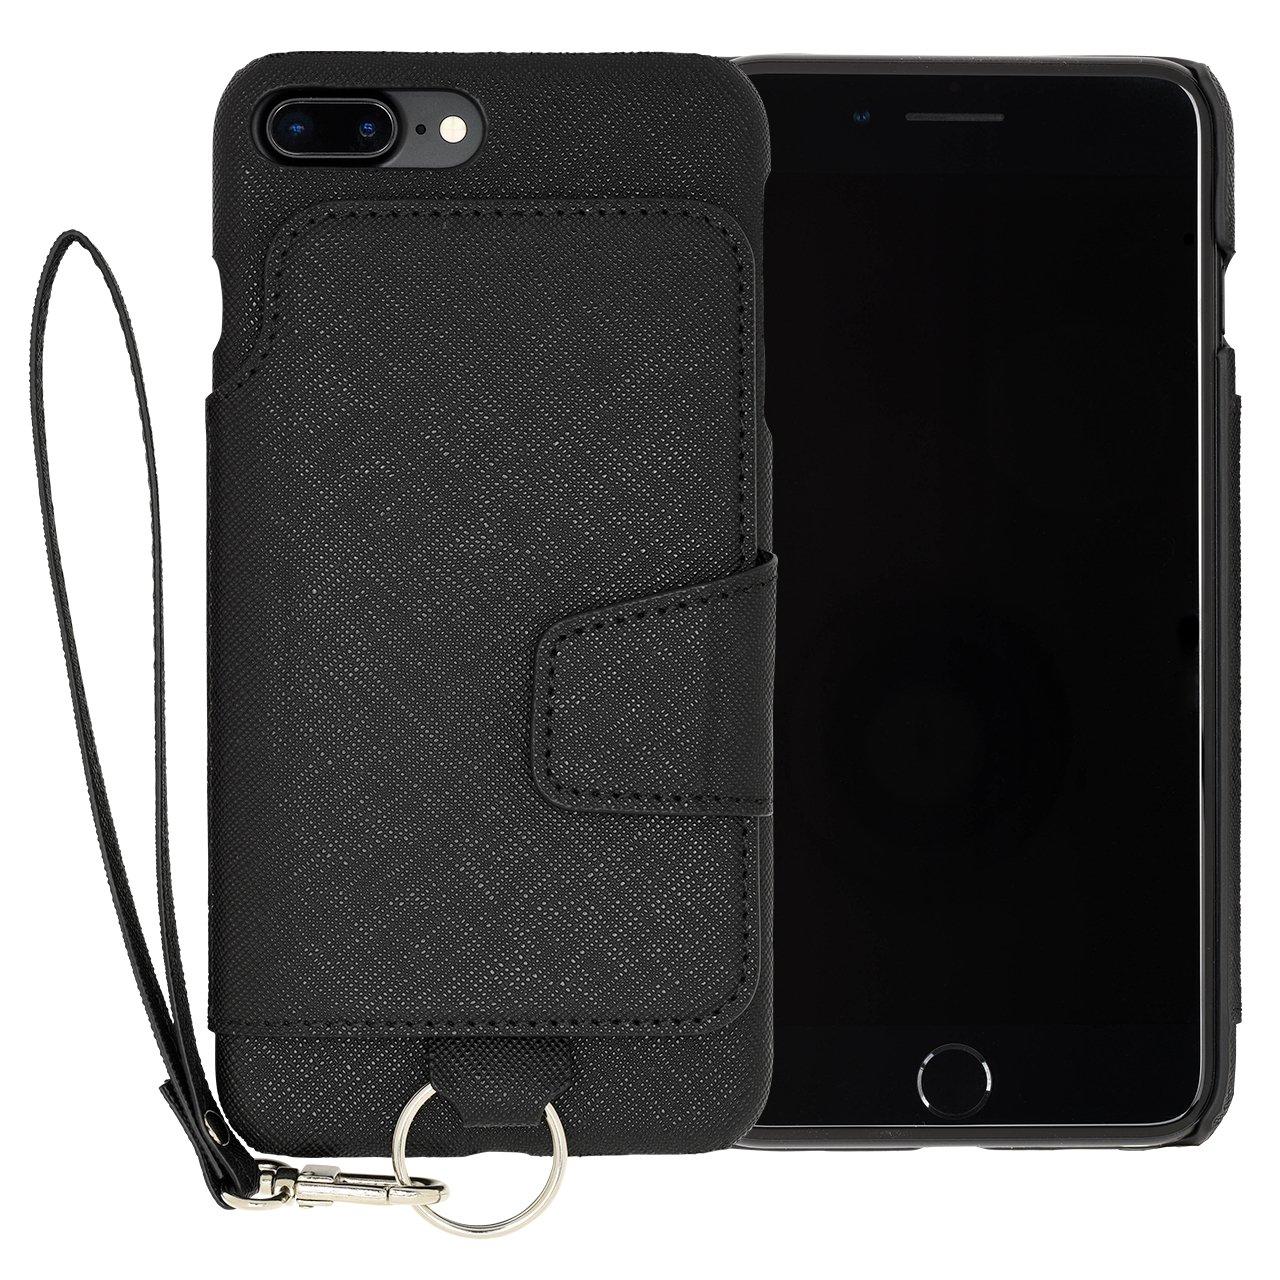 RAKUNI Light PU Leather Case Book Type with Strap for iPhone 7 Plus / iPhone 8 Plus (ブラック) PUレザー スタンド機能 カードケース カバー ストラップホール付き RCB-7P-BK